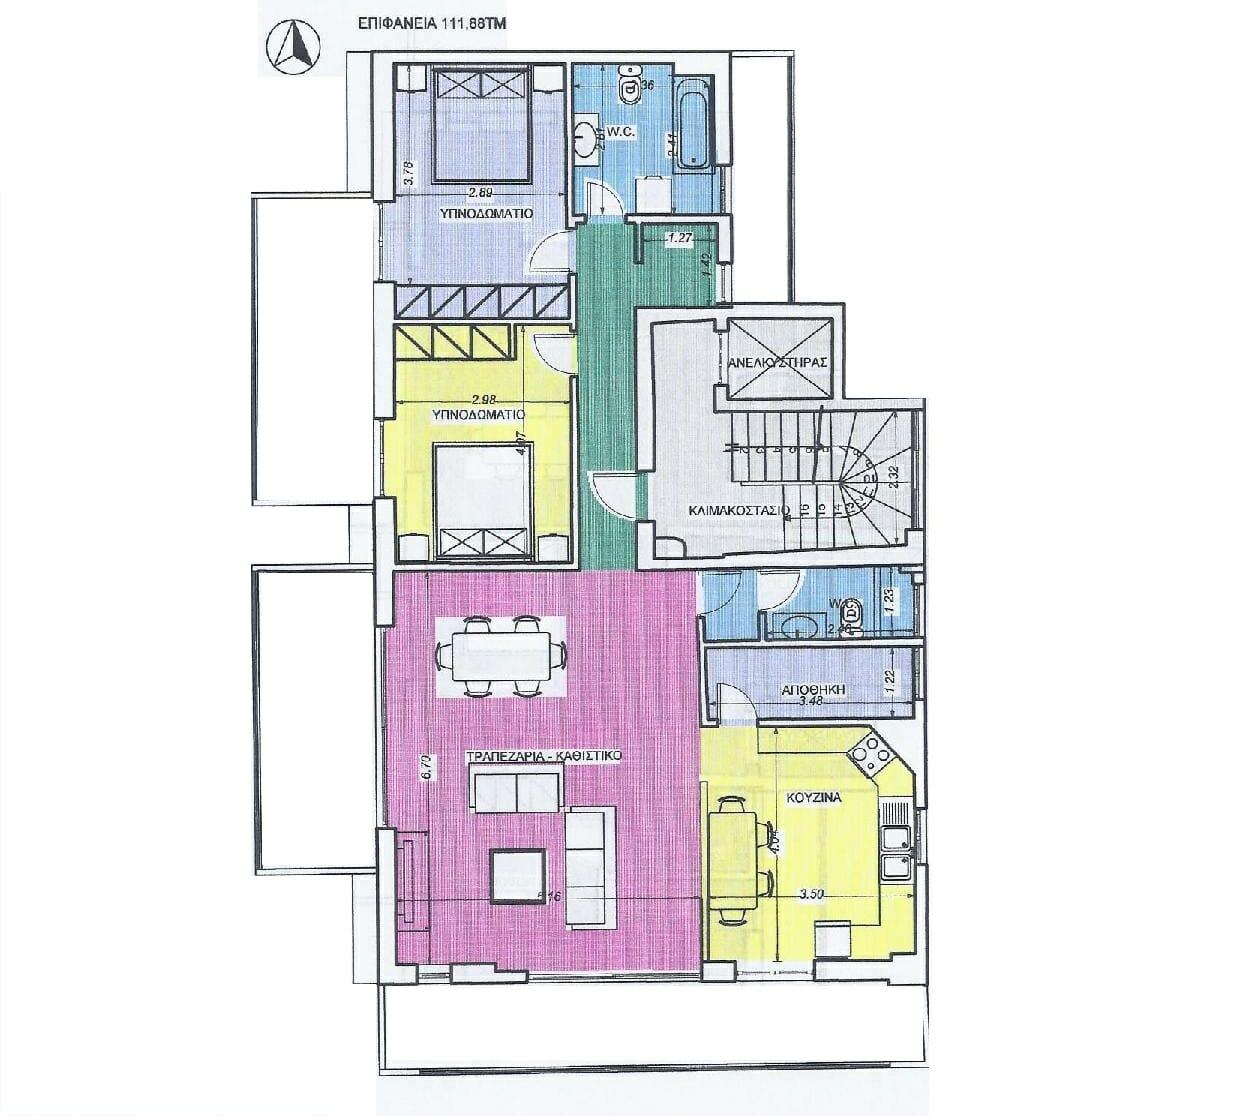 Kalamata Top Rooms Apartments Rent - Comfortable City Apartment